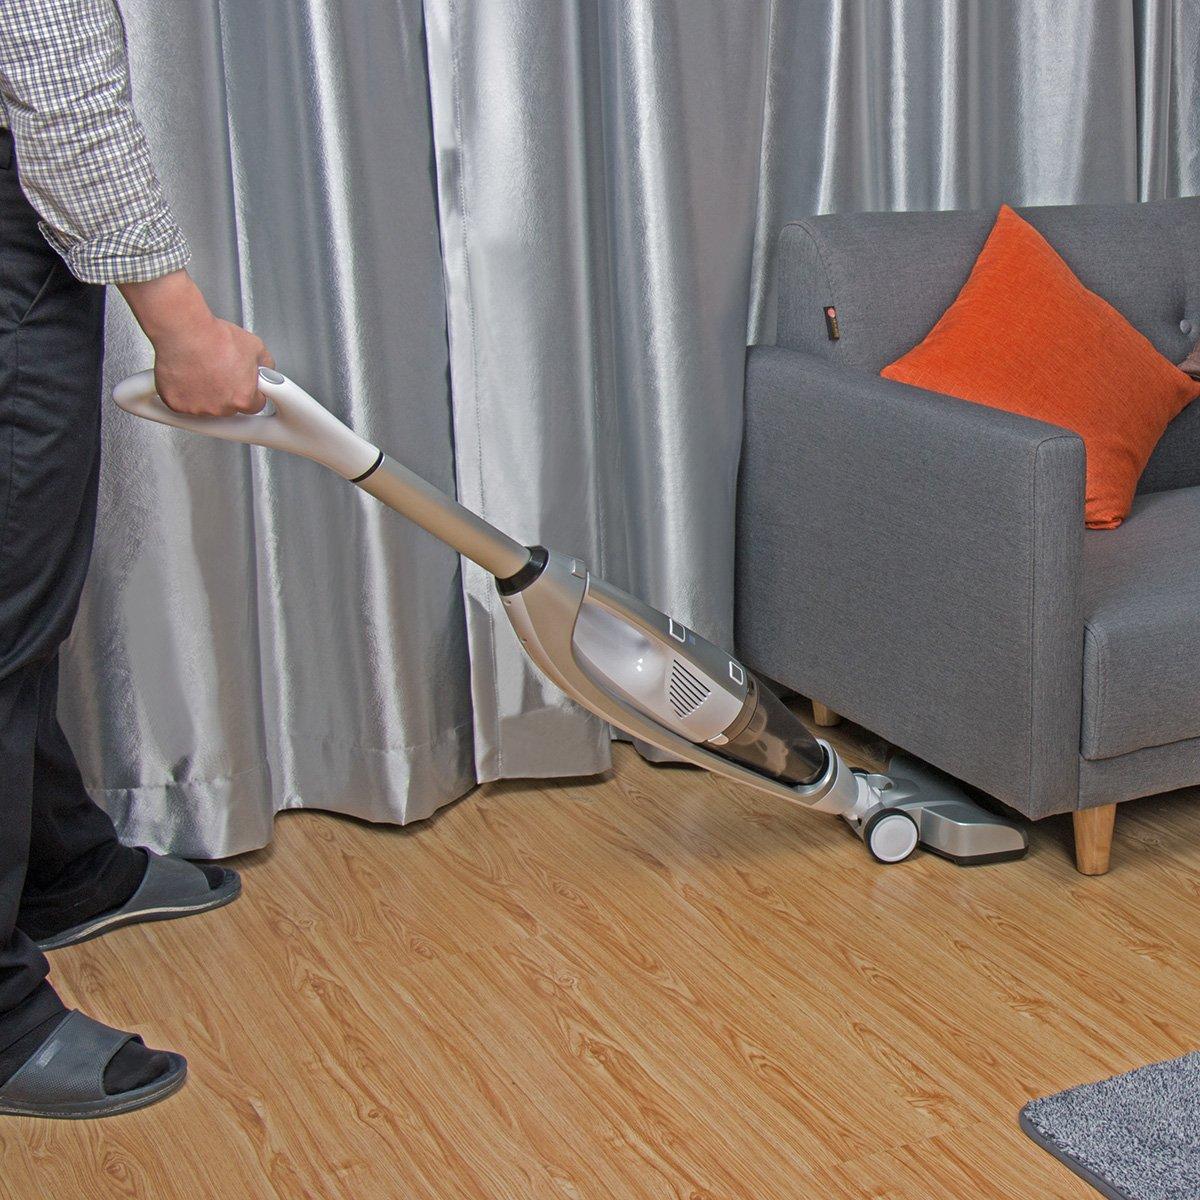 Cordless Vacuum Cleaner, EVERTOP 4 in 1 Bagless Stick Upright Vacuum Cleaner, Handheld Vacuum Cleaner, Floor Carpet Sweeper, Wet-Dry Vacuum Mop Cleaner for Hard Floor, Thin Carpet (Silver)